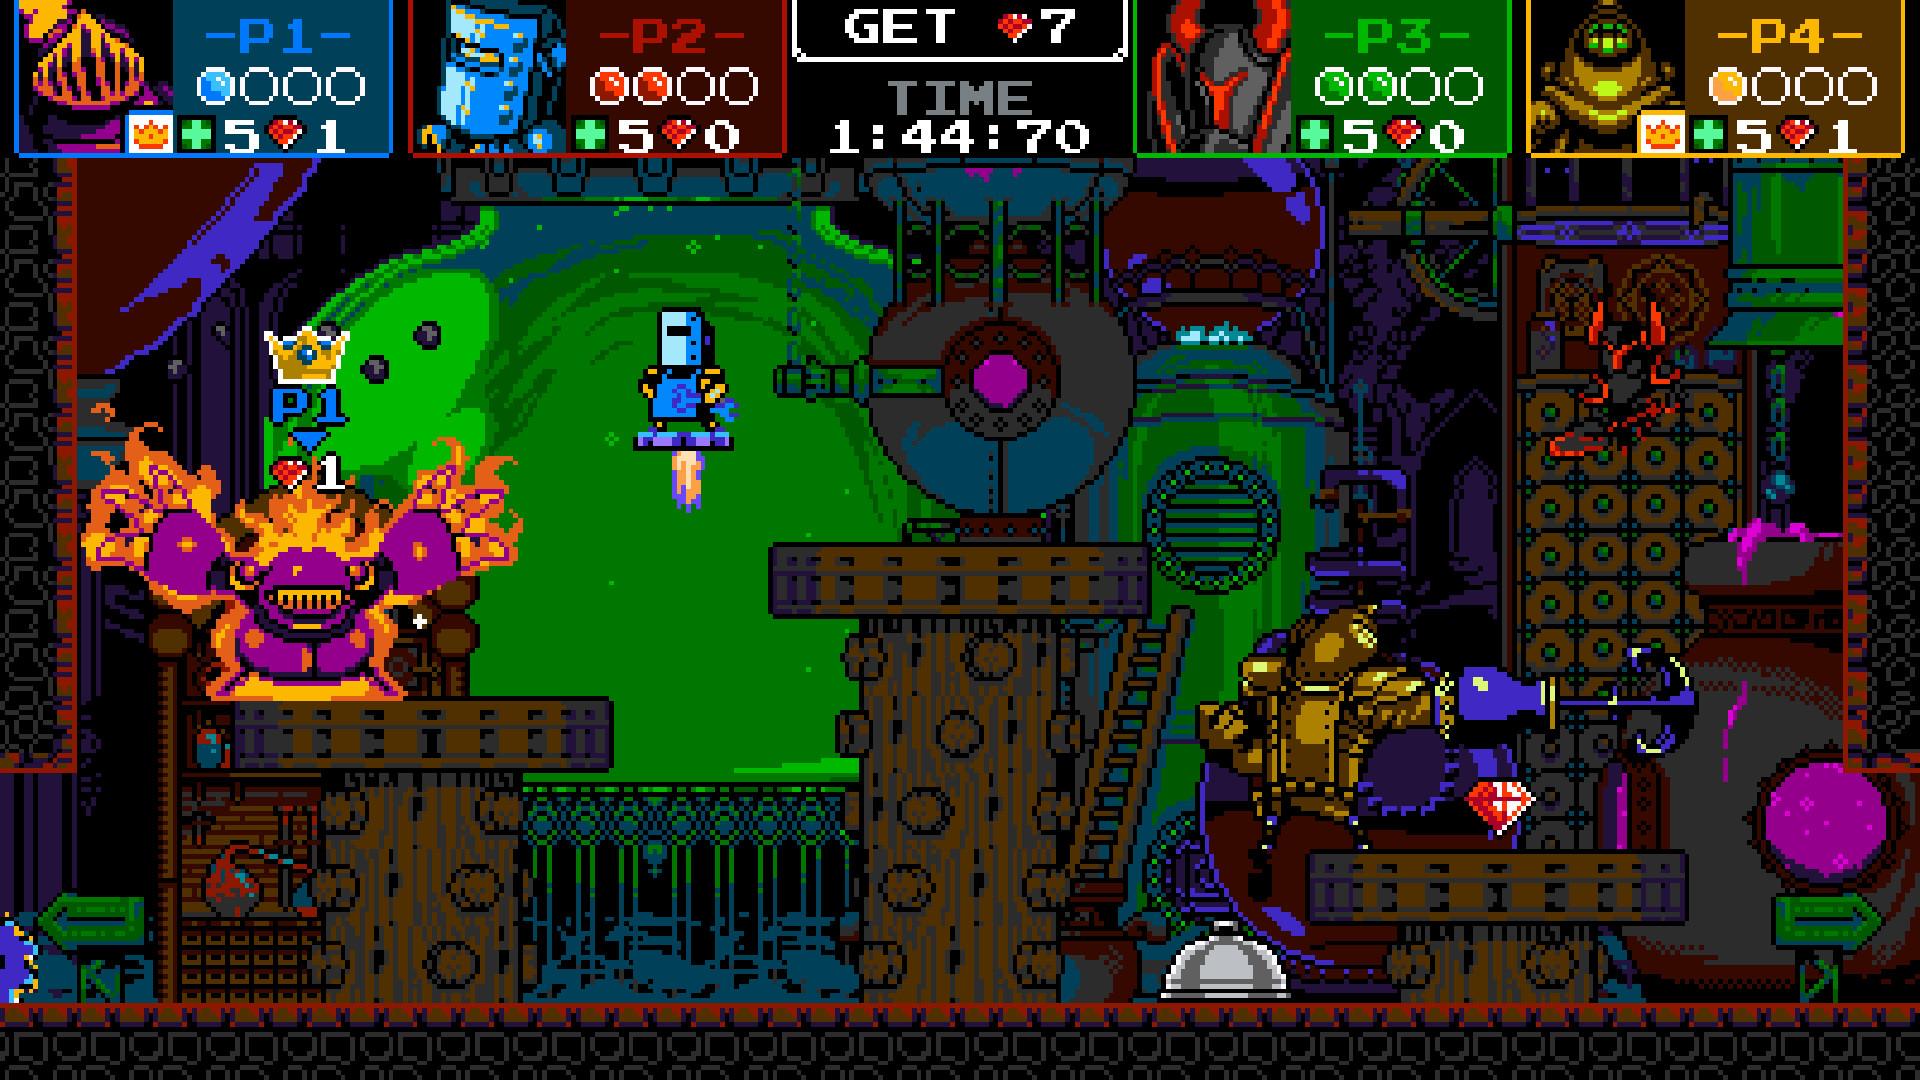 A screenshot from Shovel Knight: Showdown on PC